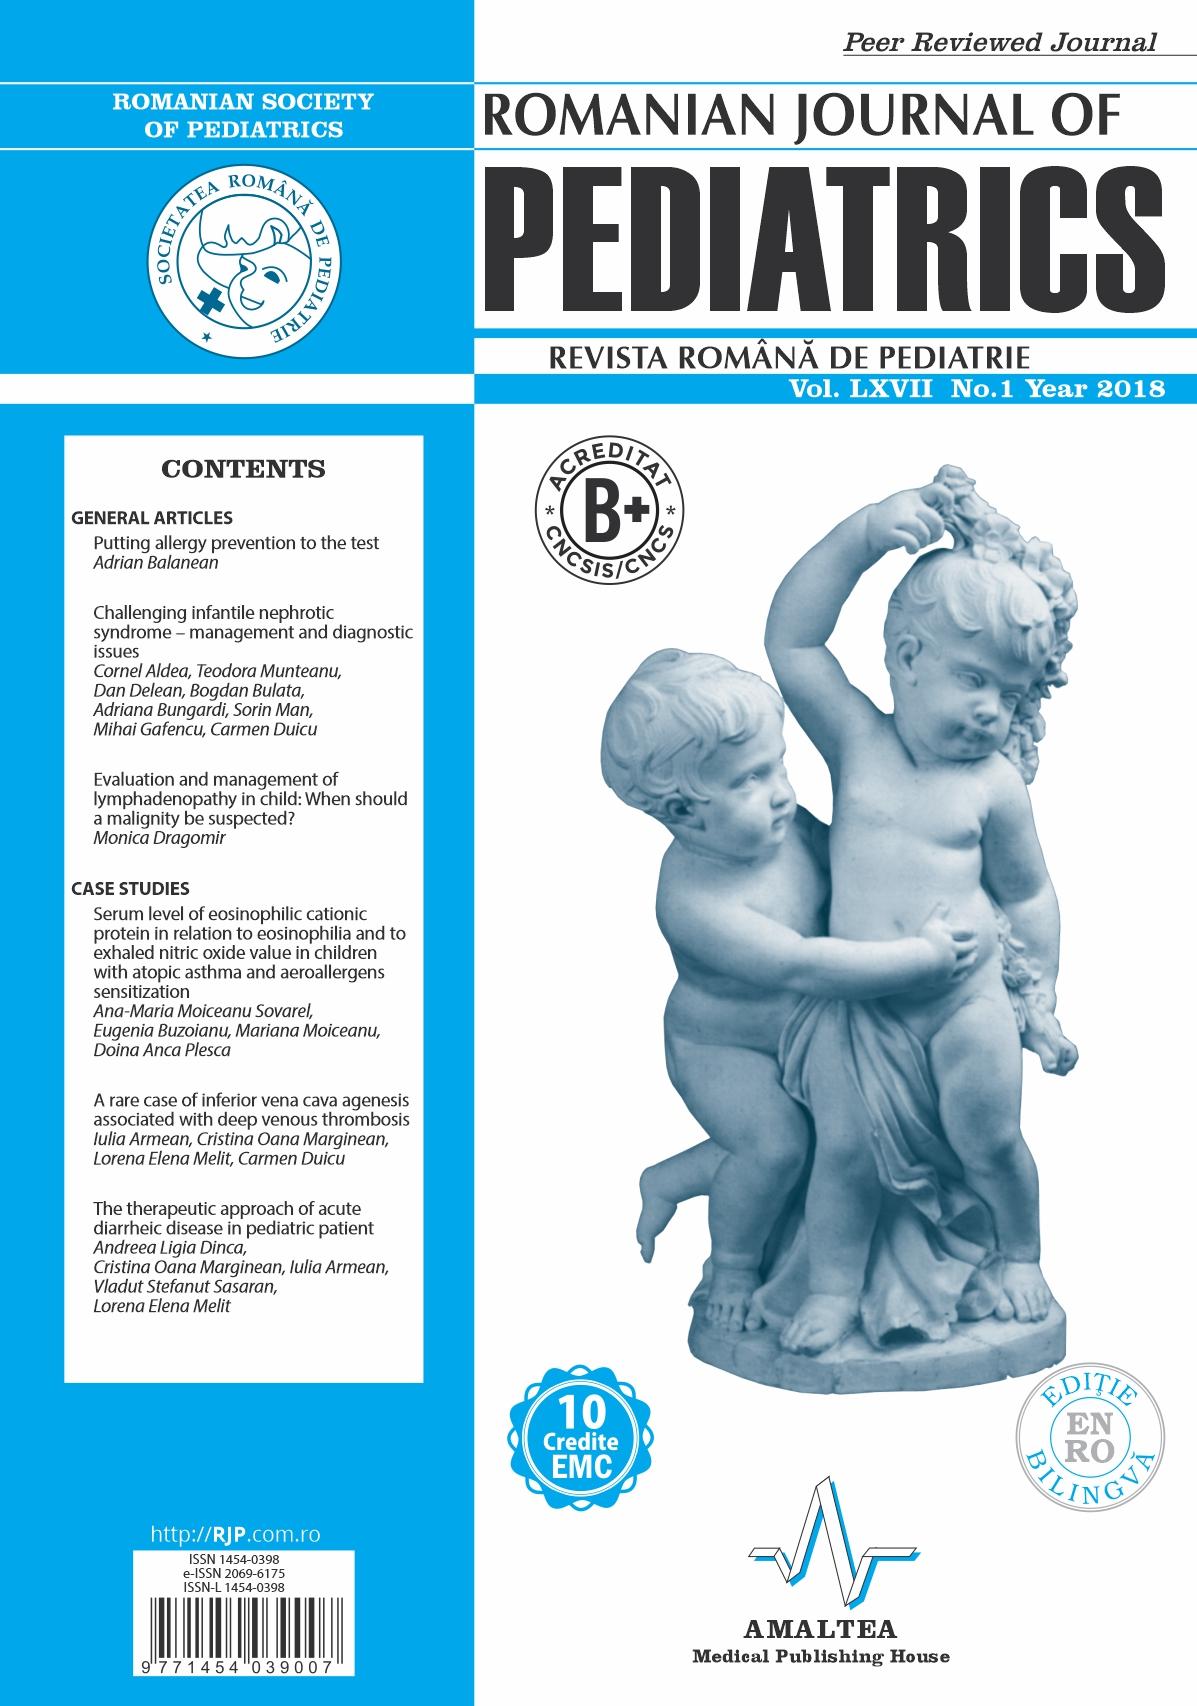 Romanian Journal of Pediatrics   Volume LXVII, No. 1, Year 2018